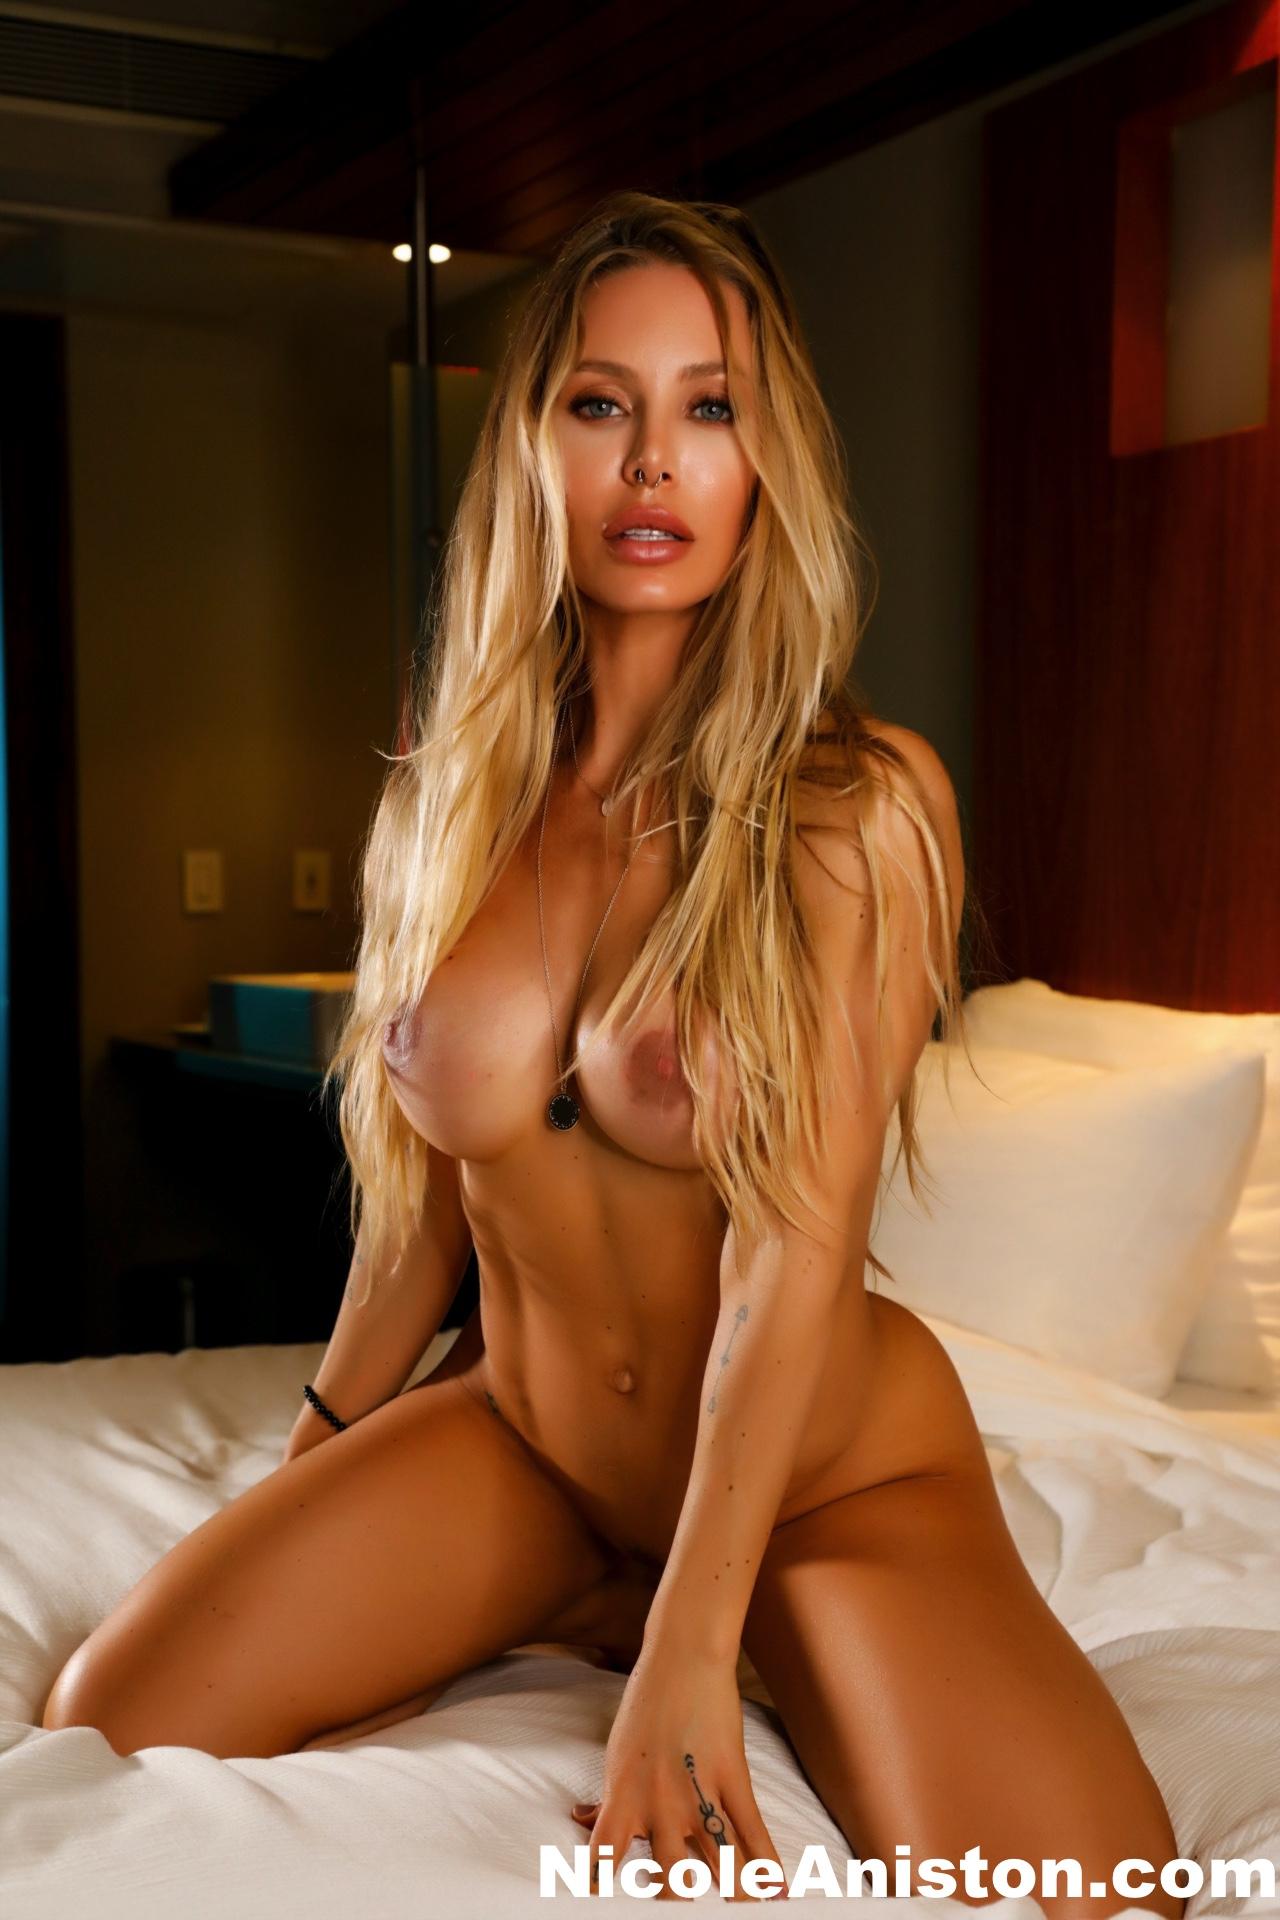 Sexy nicole aniston 41 Sexiest